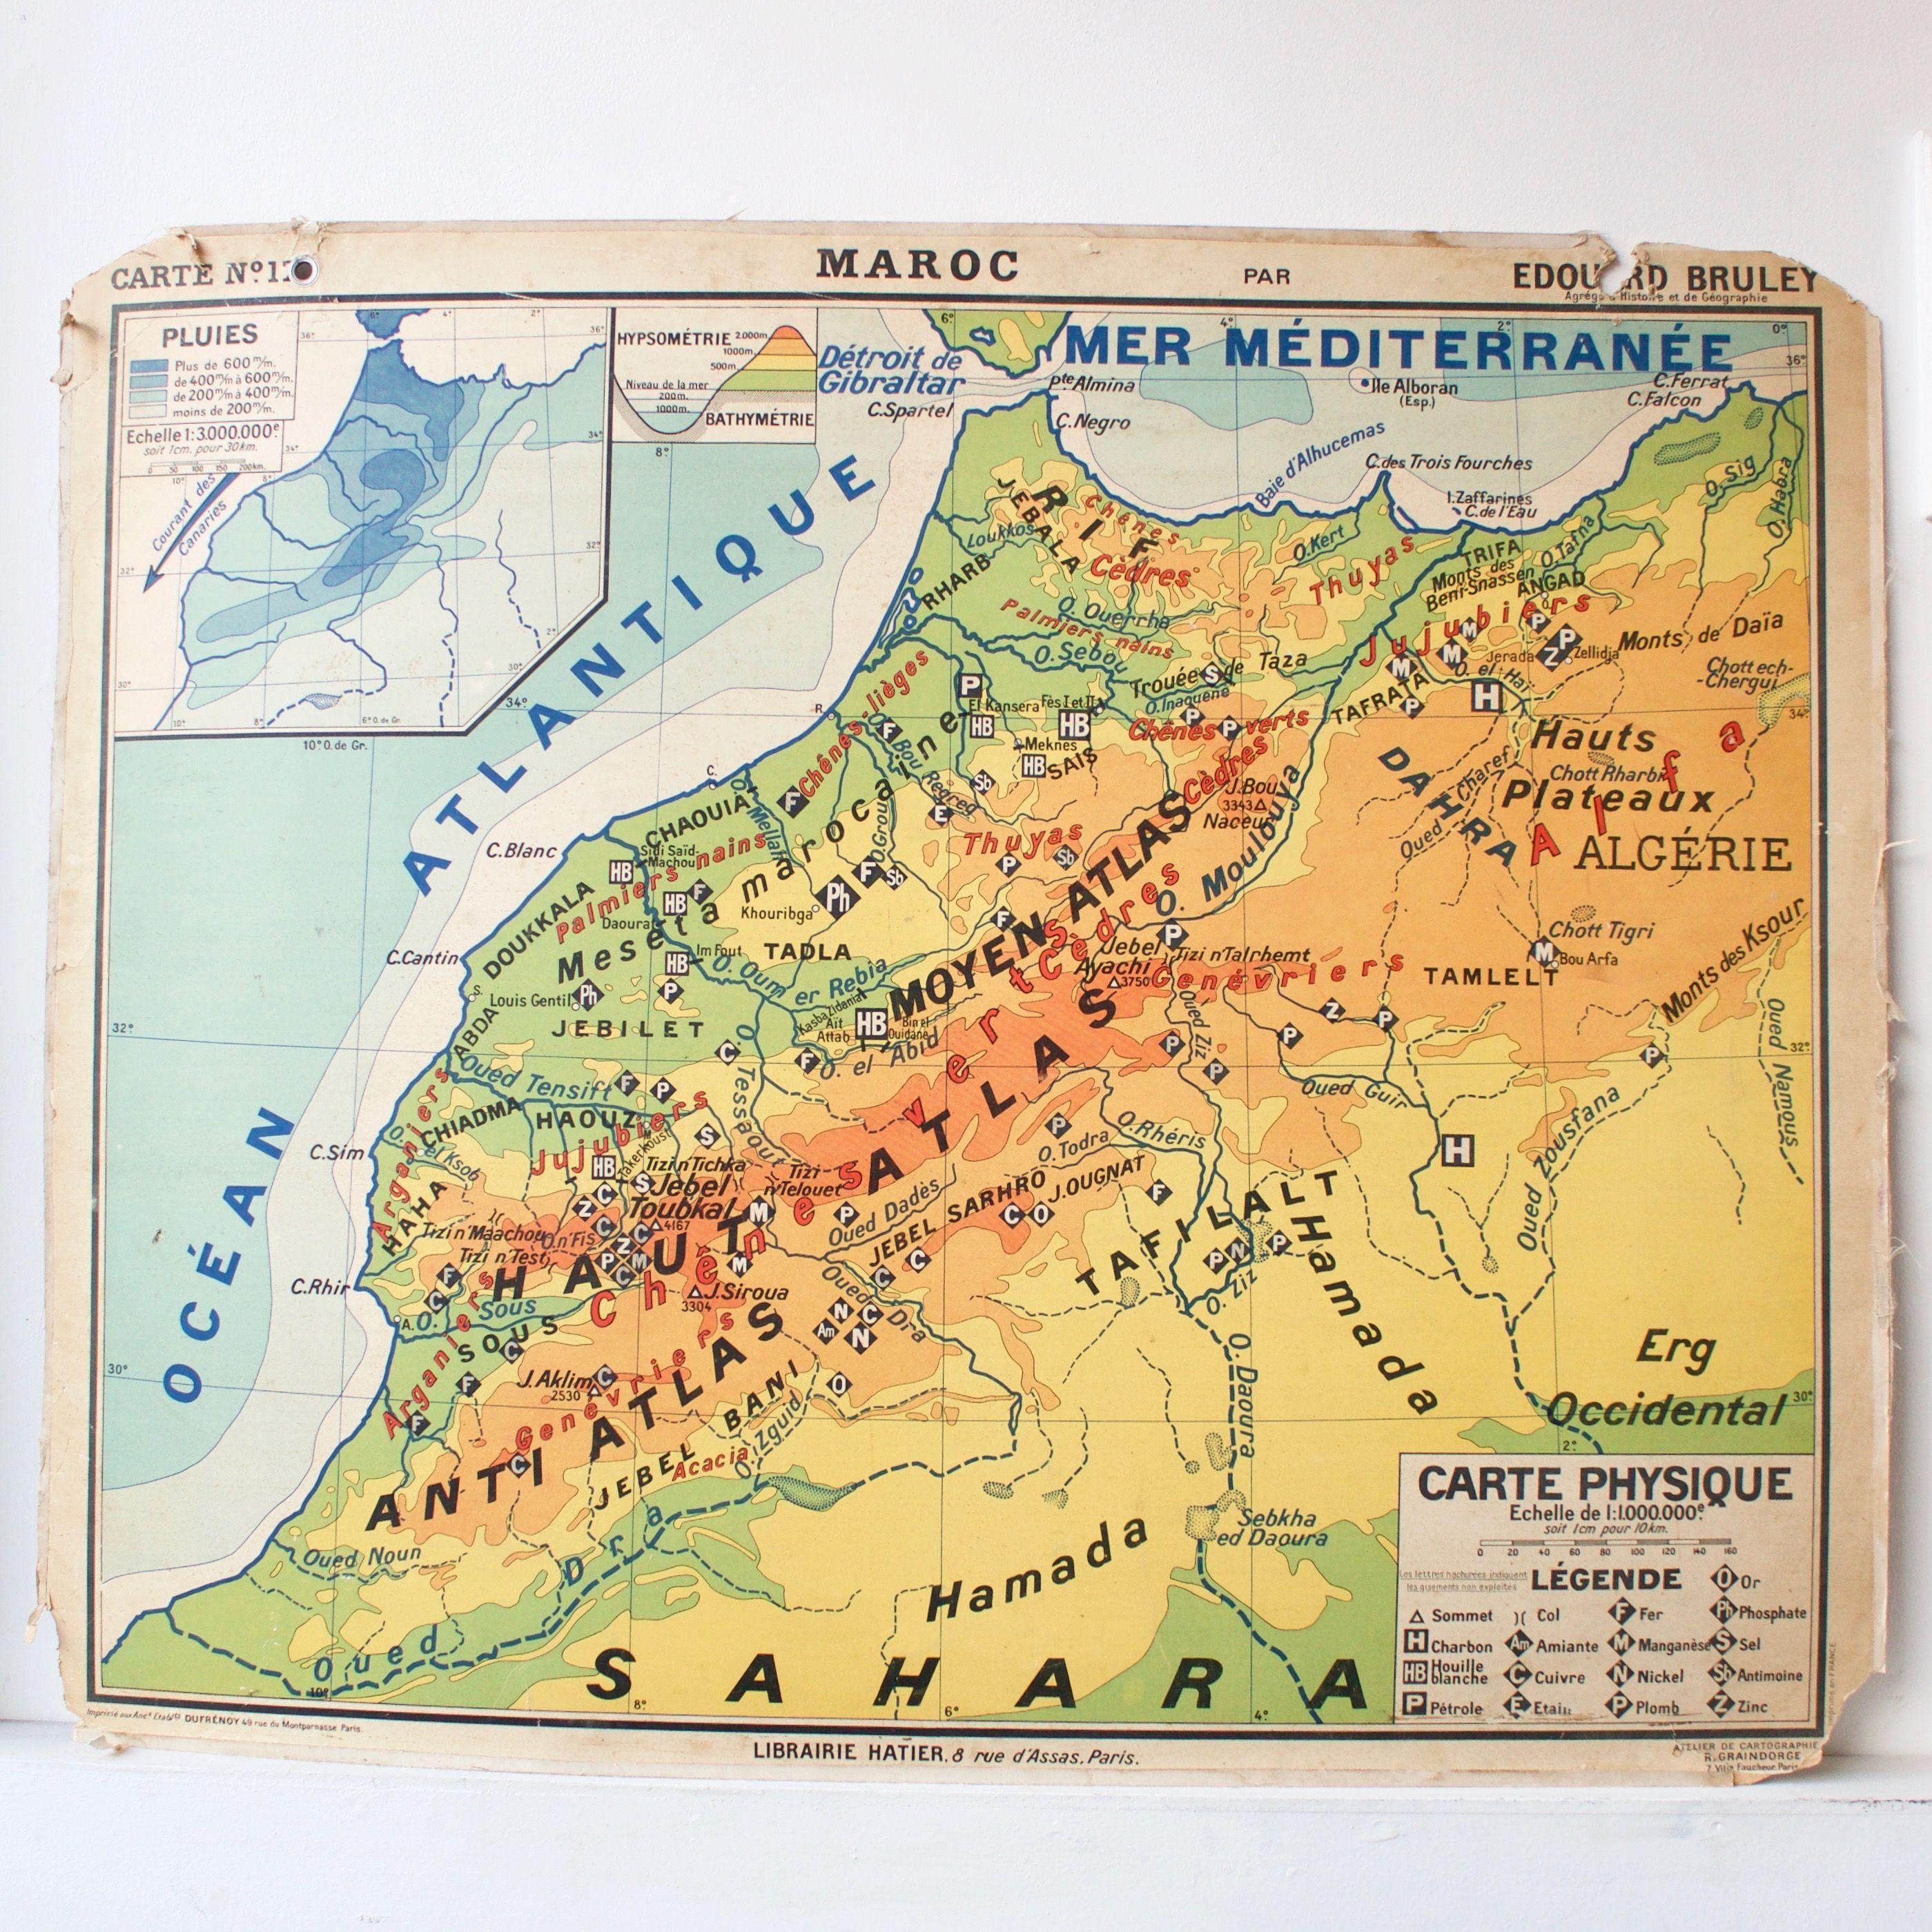 85 carte scolaire ancienne 17 maroc old school map morocco cartes anciennes pinterest. Black Bedroom Furniture Sets. Home Design Ideas